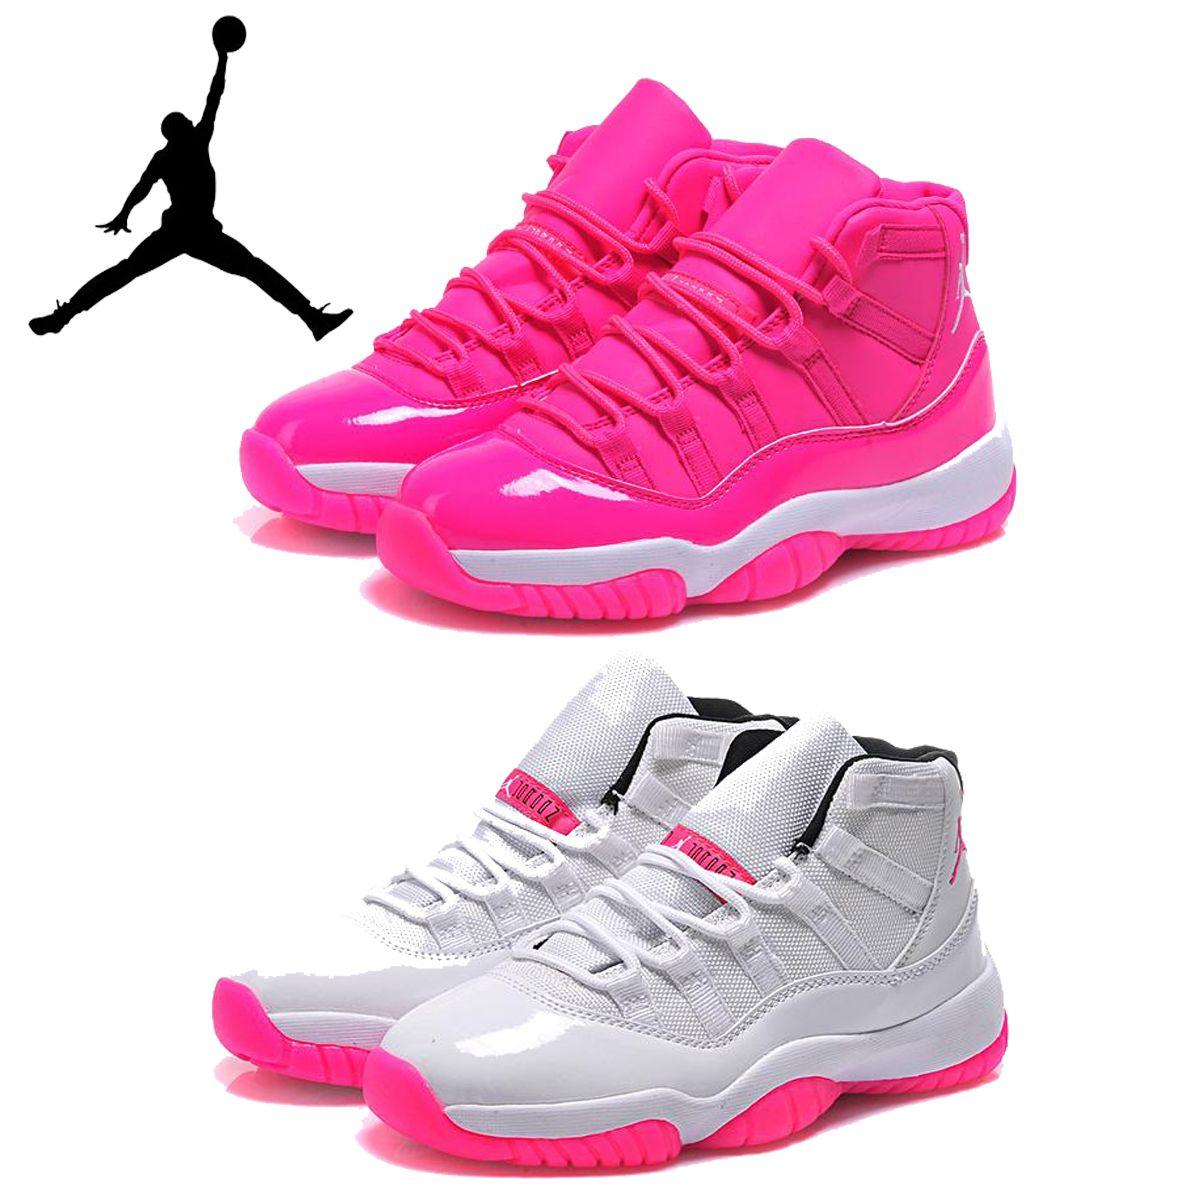 Lady Jordan Basketball Shoes